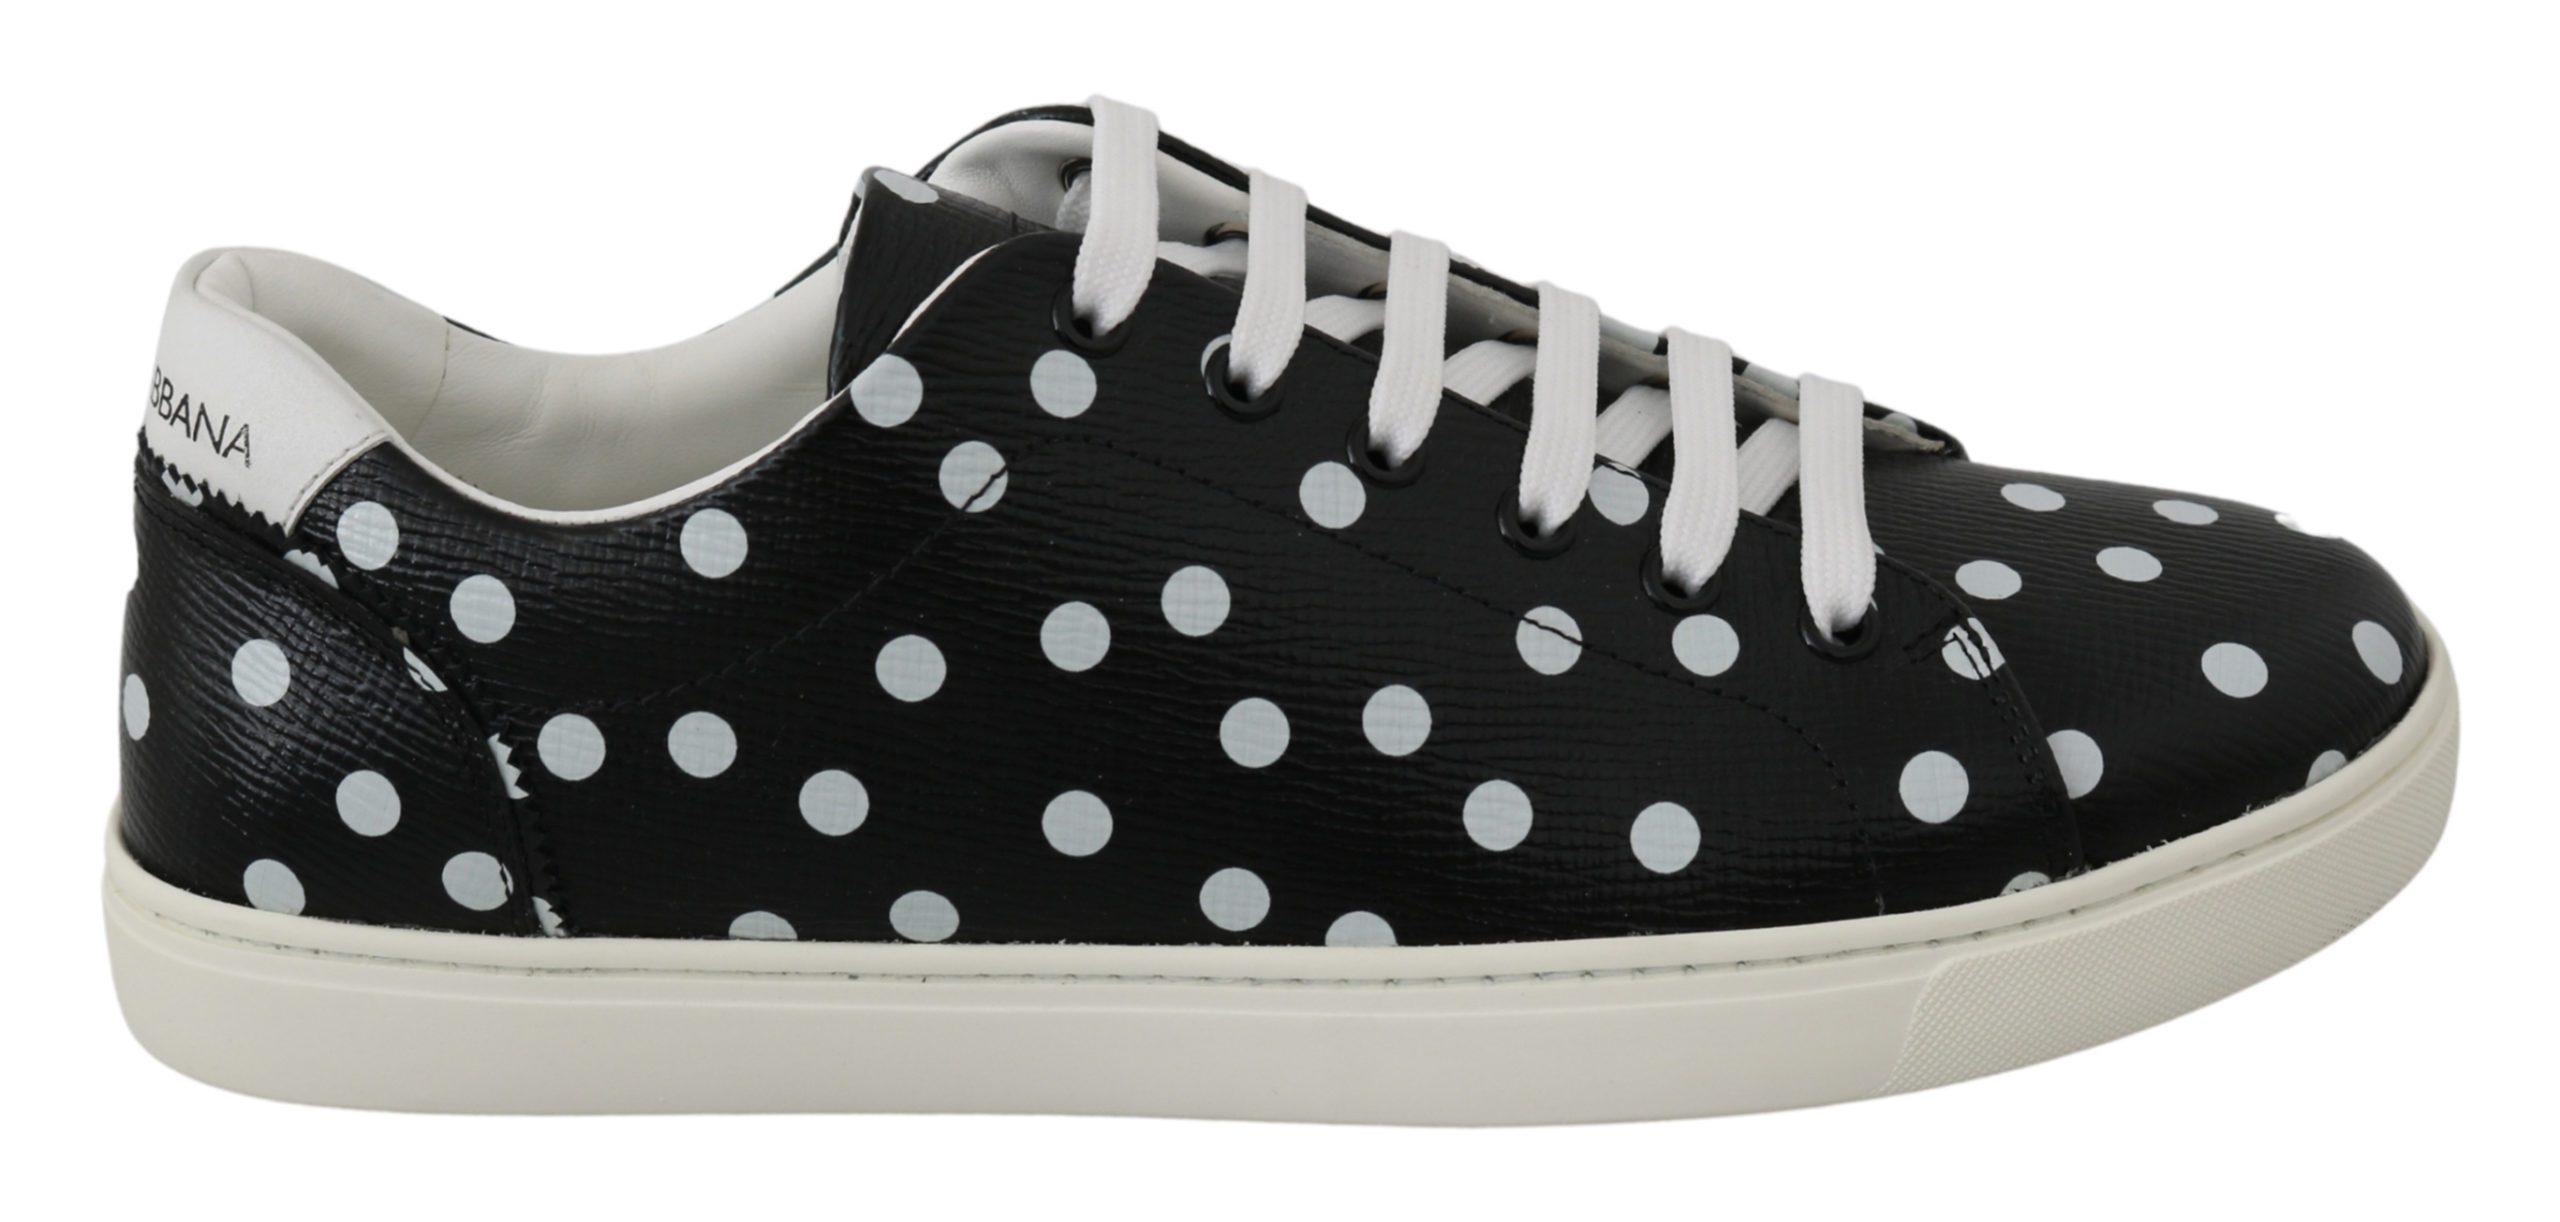 Dolce & Gabbana Women's Leather Polka Dots Trainer Black LA6449 - EU40/US9.5